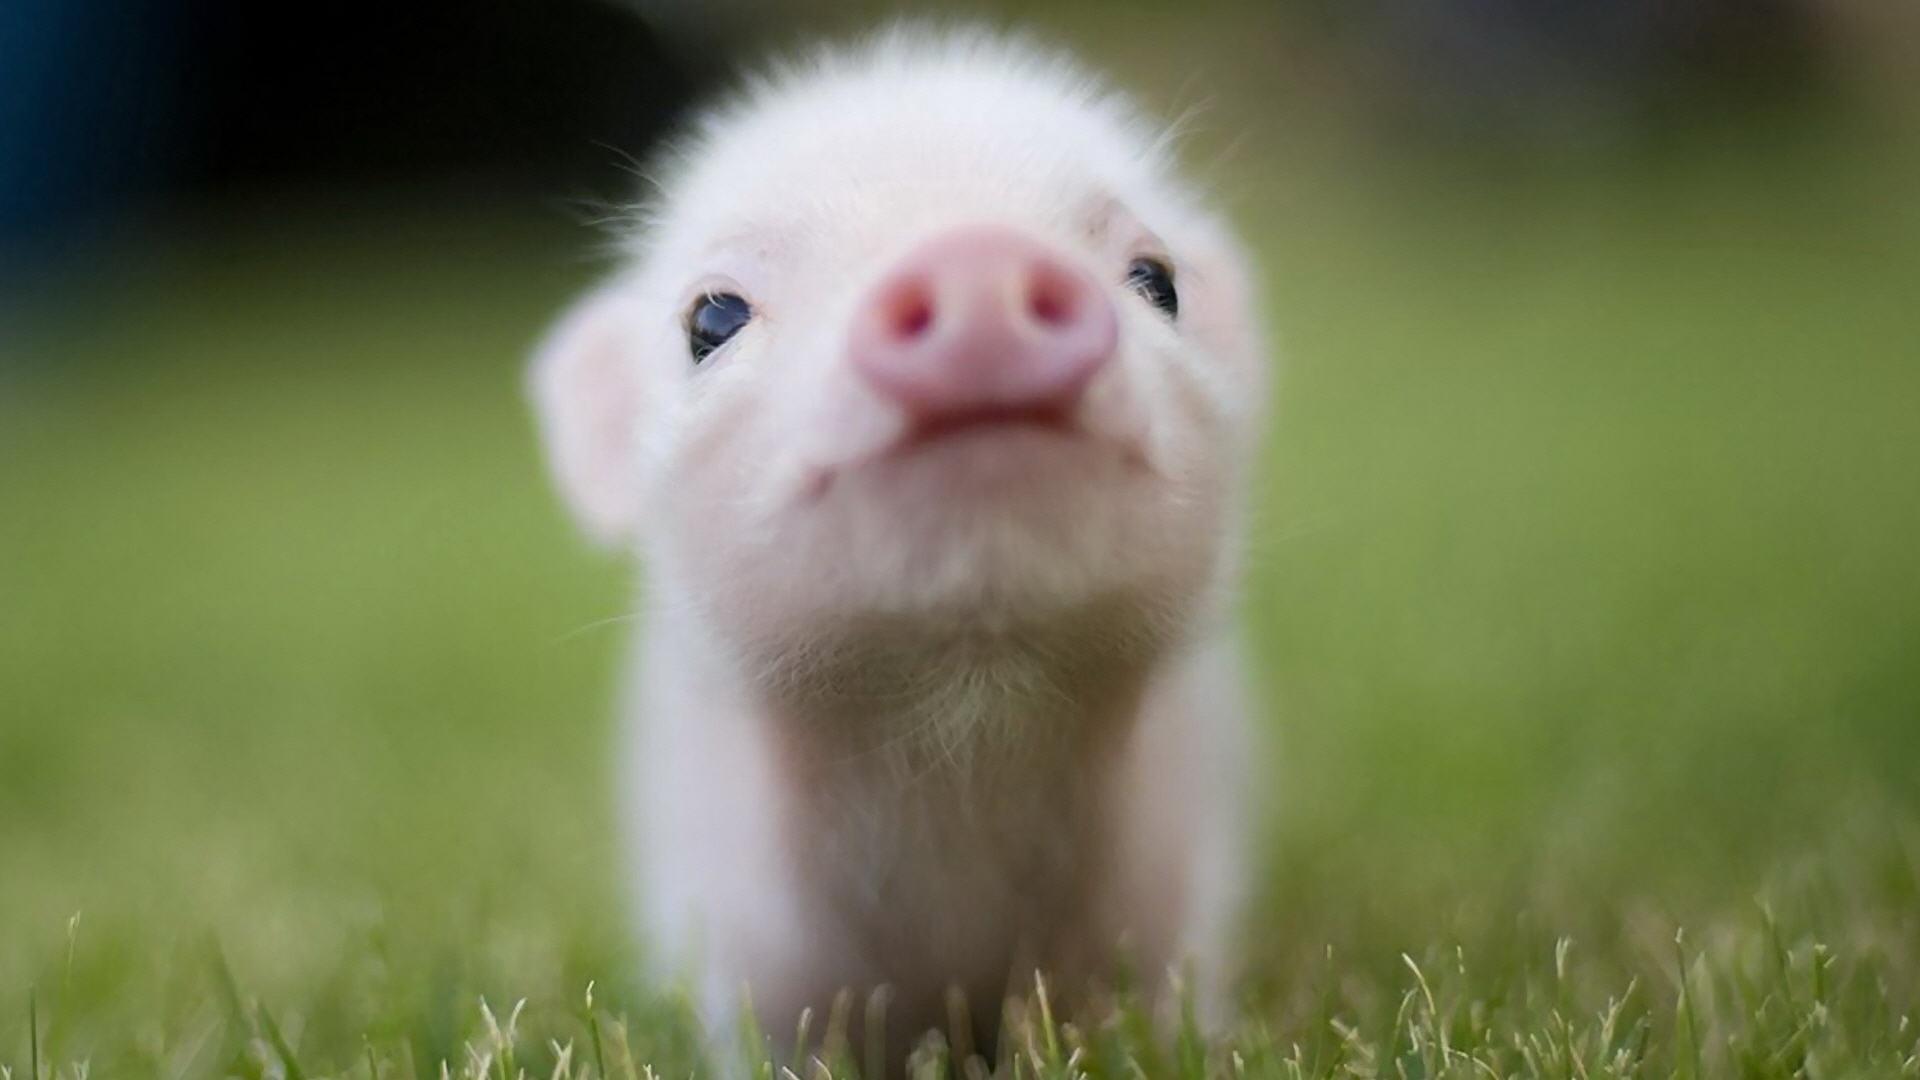 Cute Pig Wallpaper 24430 1920x1200 px